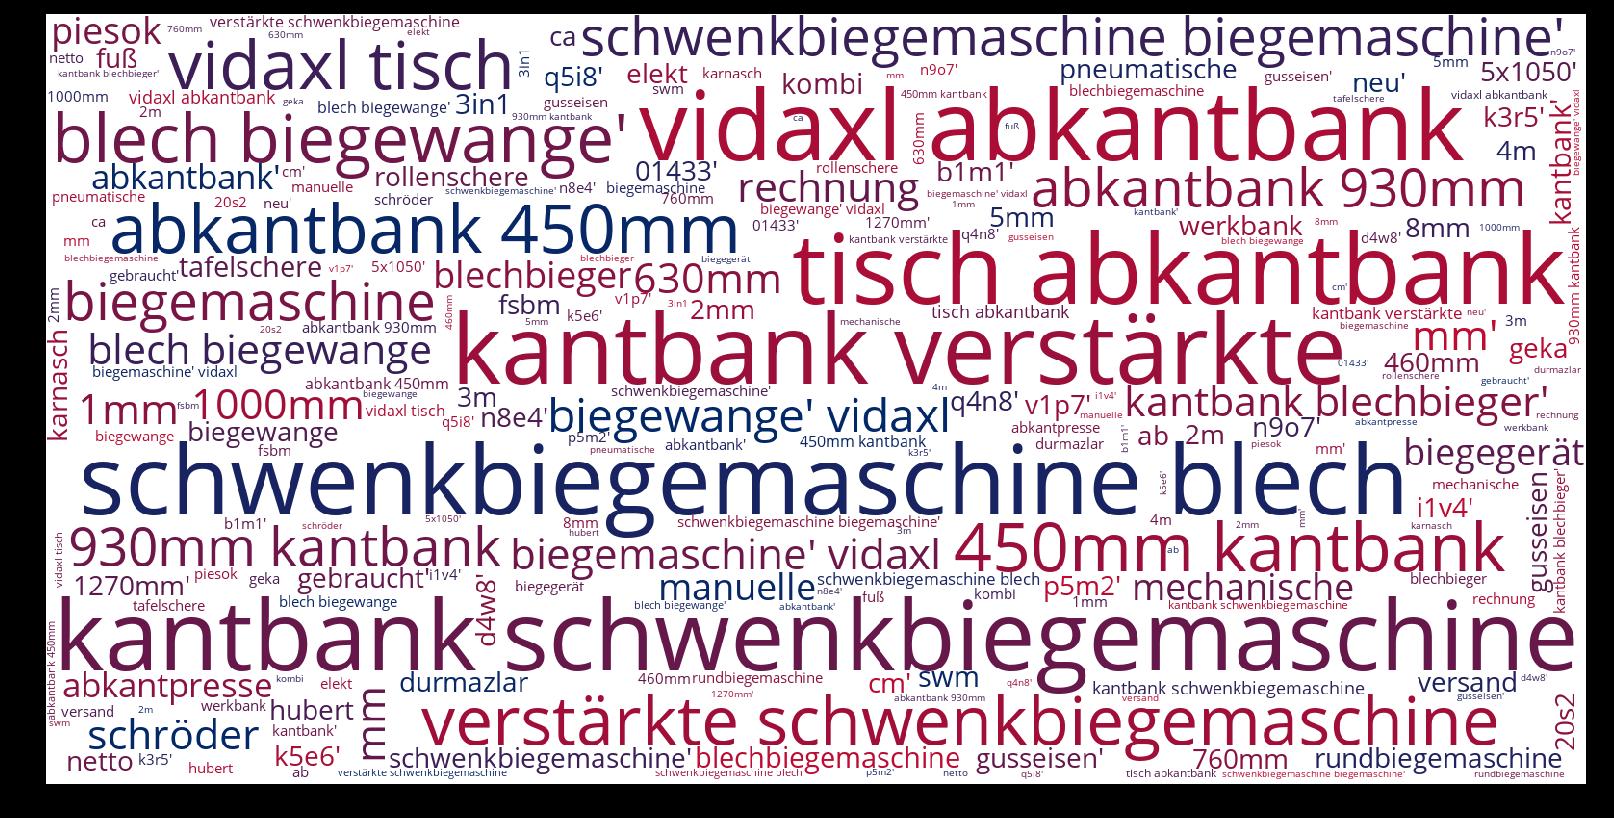 Schwenkbiegemaschine-wordcloud